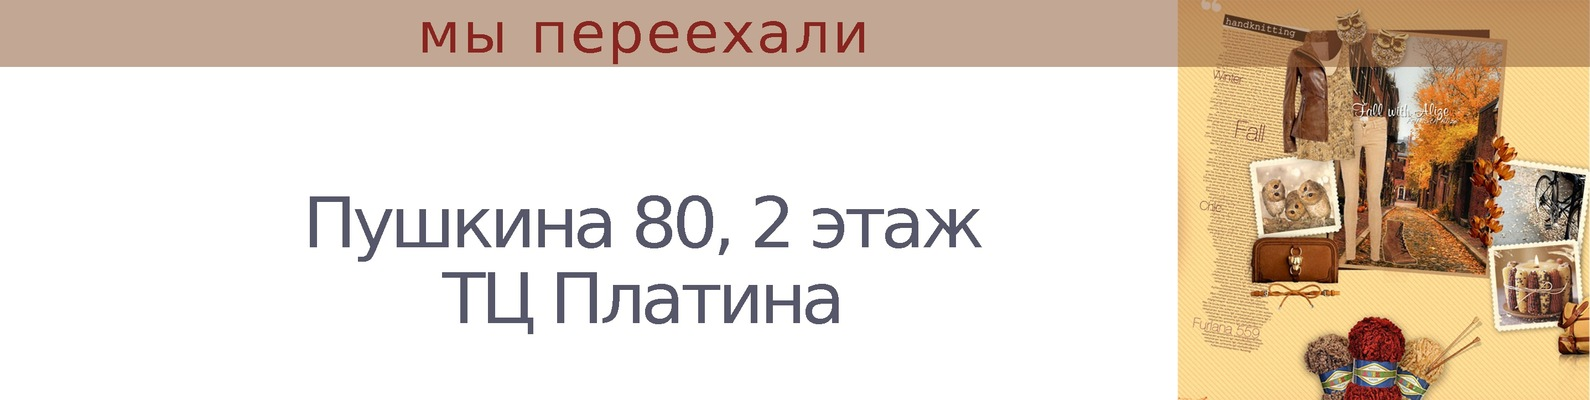 магазин пряжи на пушкина пермь